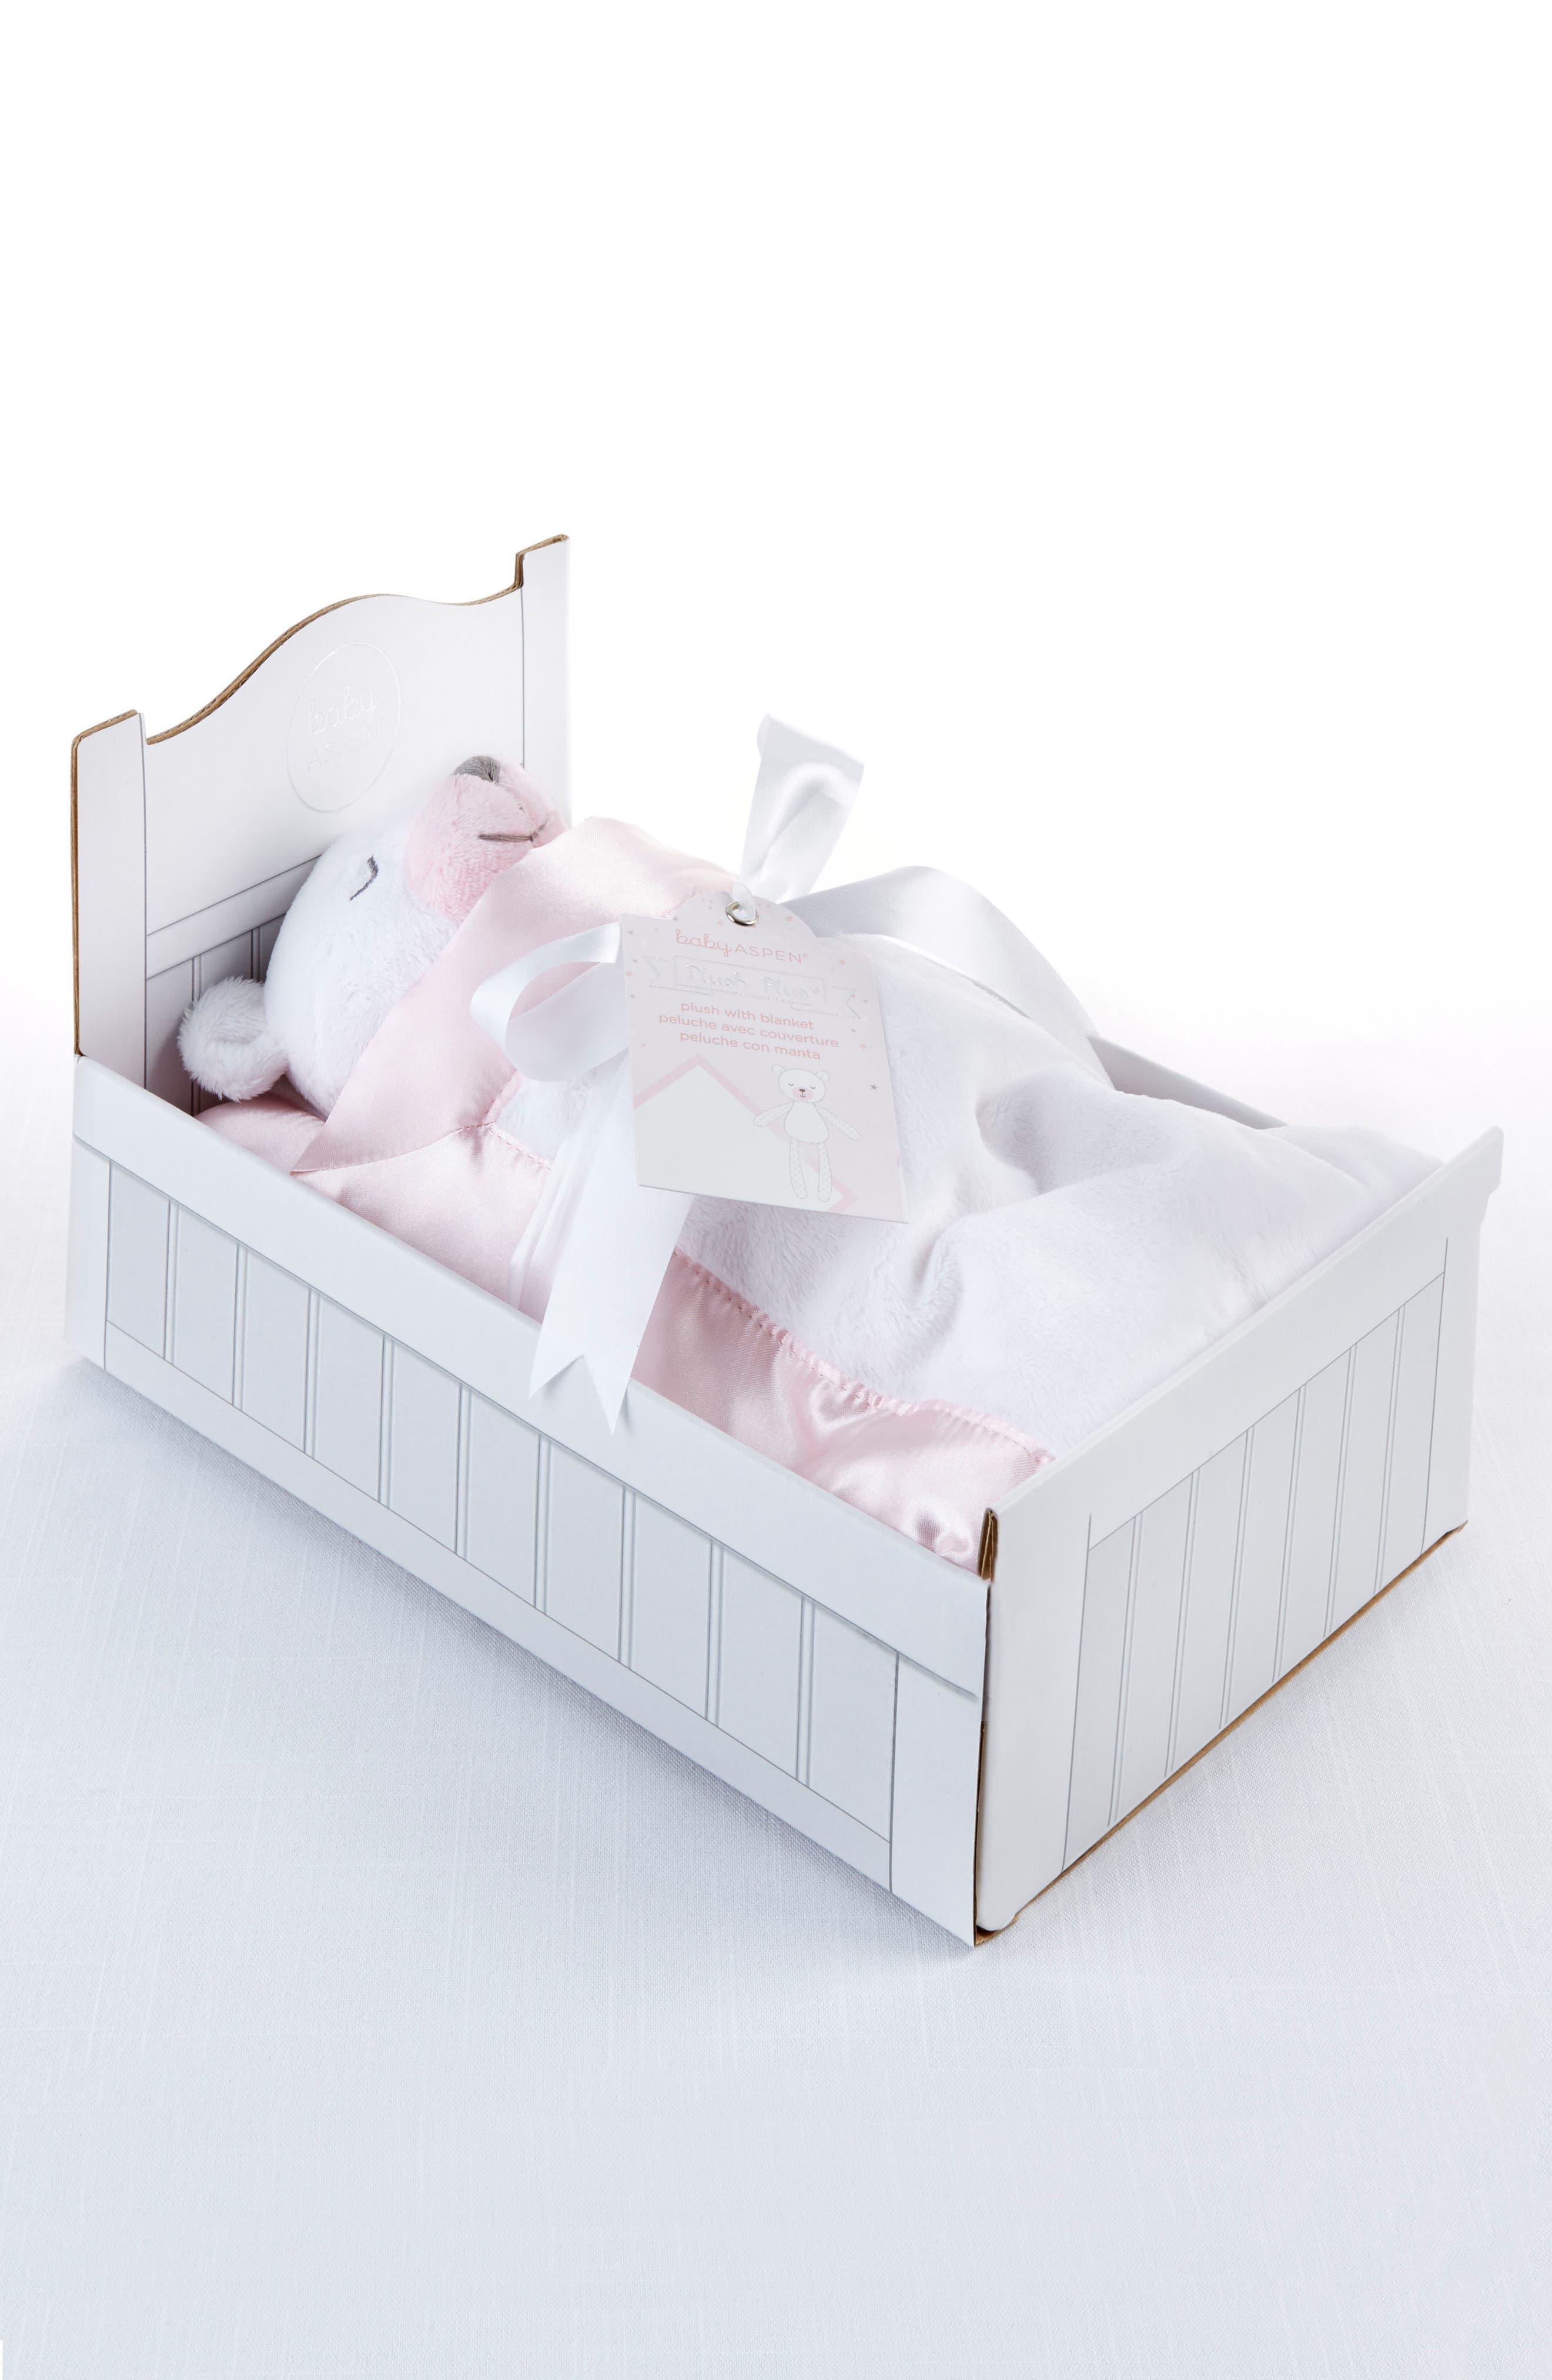 Beary Sleepy - Plush Plus Stuffed Animal & Blanket Set,                             Alternate thumbnail 3, color,                             PINK